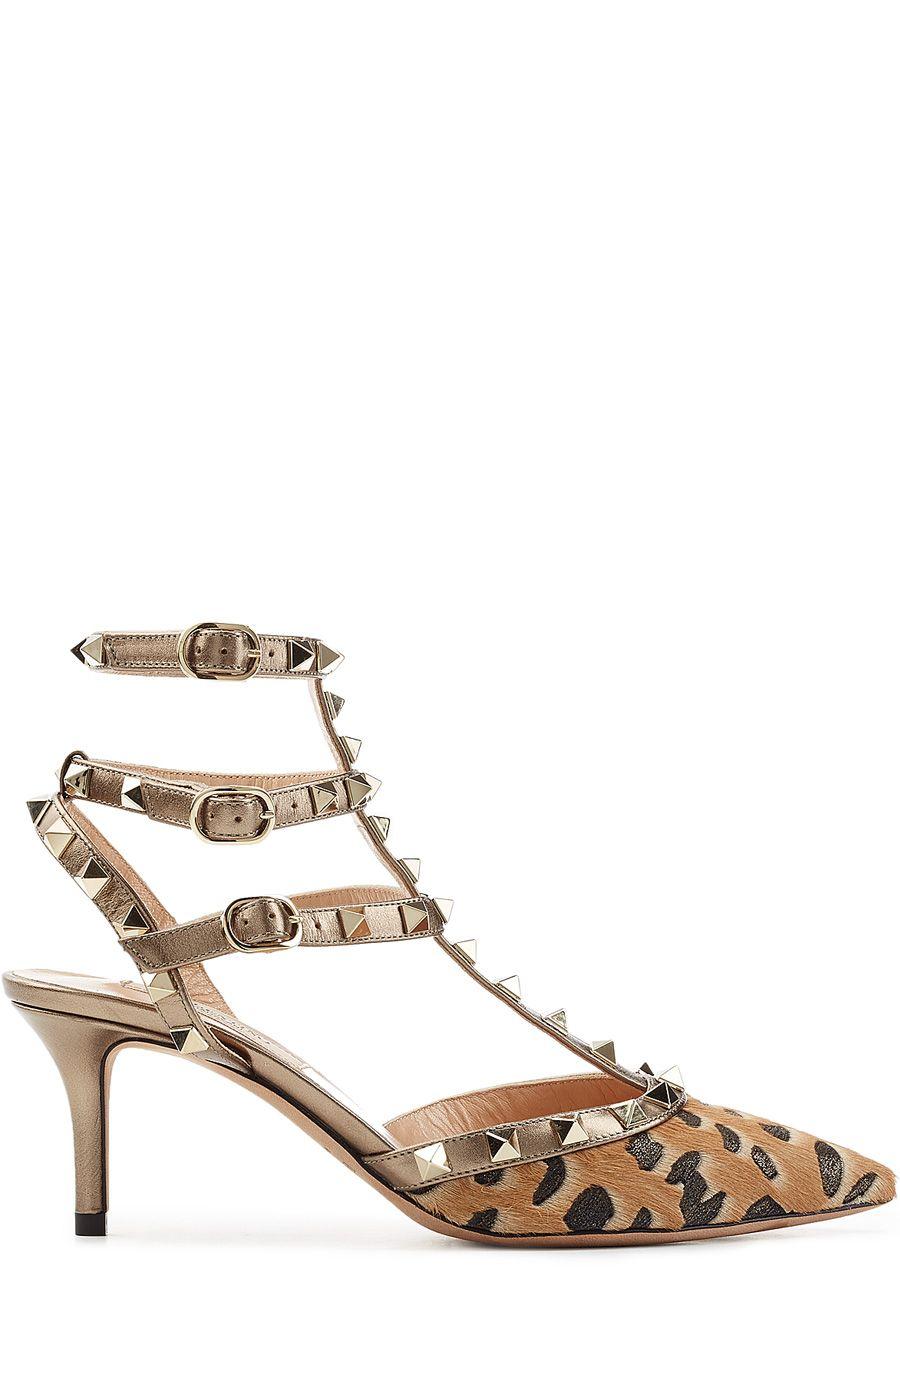 eb20680cff4 VALENTINO Rockstud Leather And Pony Hair Kitten Heel Pumps.  valentino   shoes  kitten heels